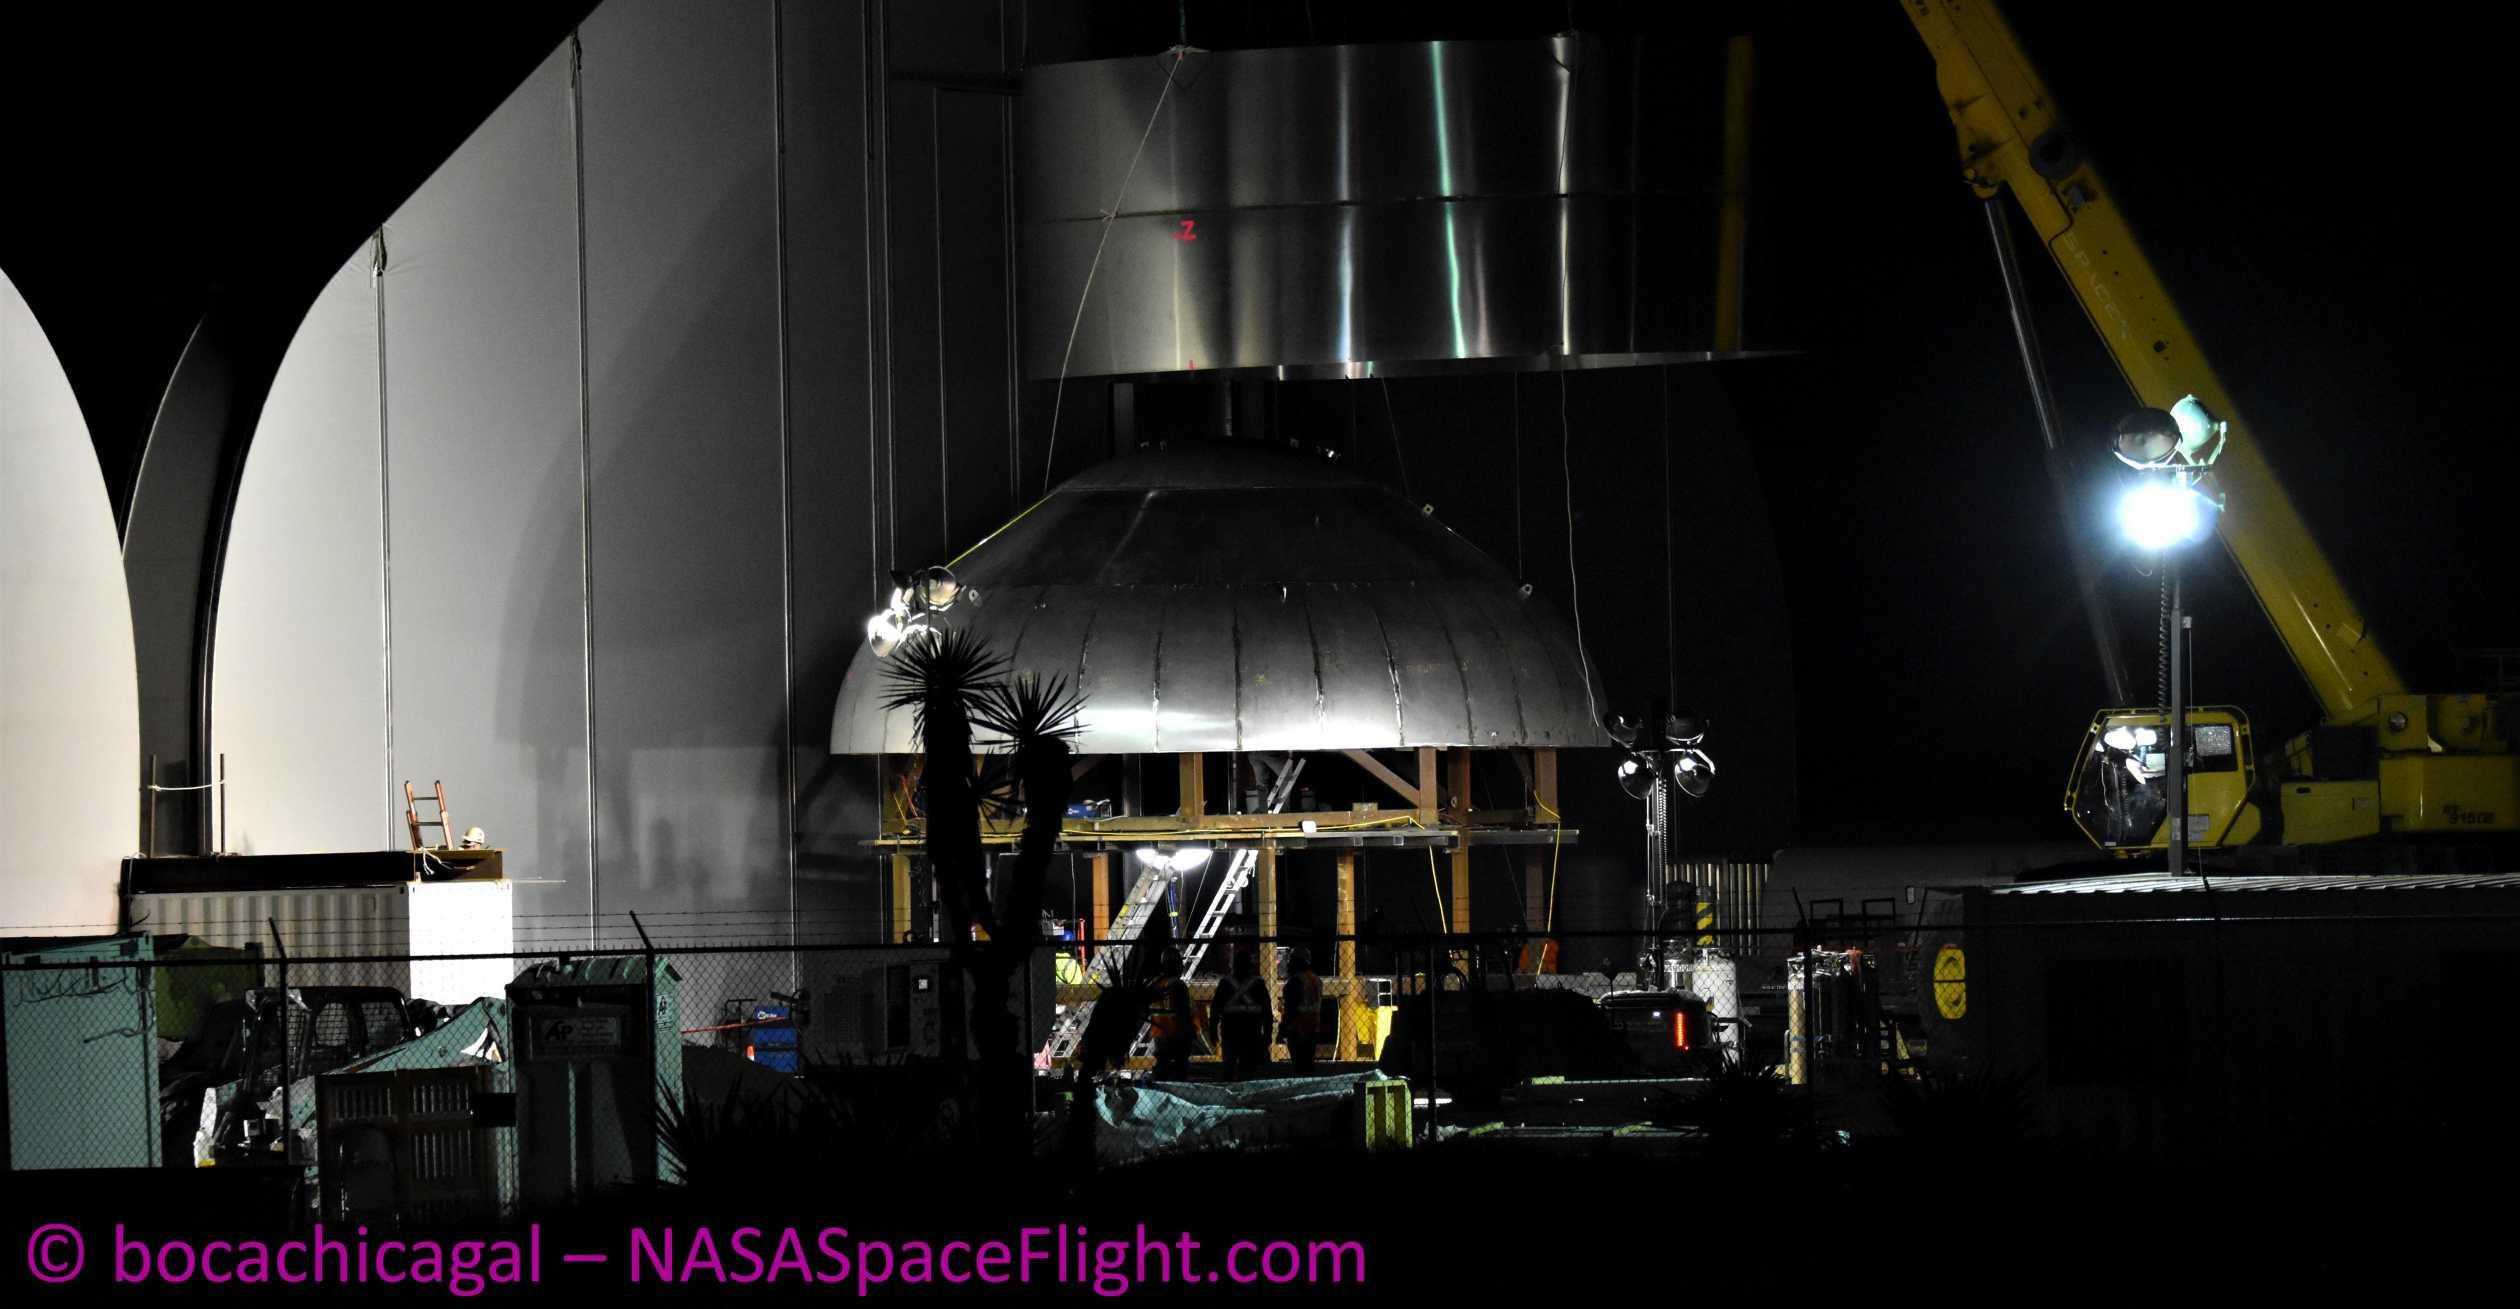 Starship Boca Chica 020820 (NASASpaceflight – bocachicagal) SN01 ring dome mate 1 crop (c)